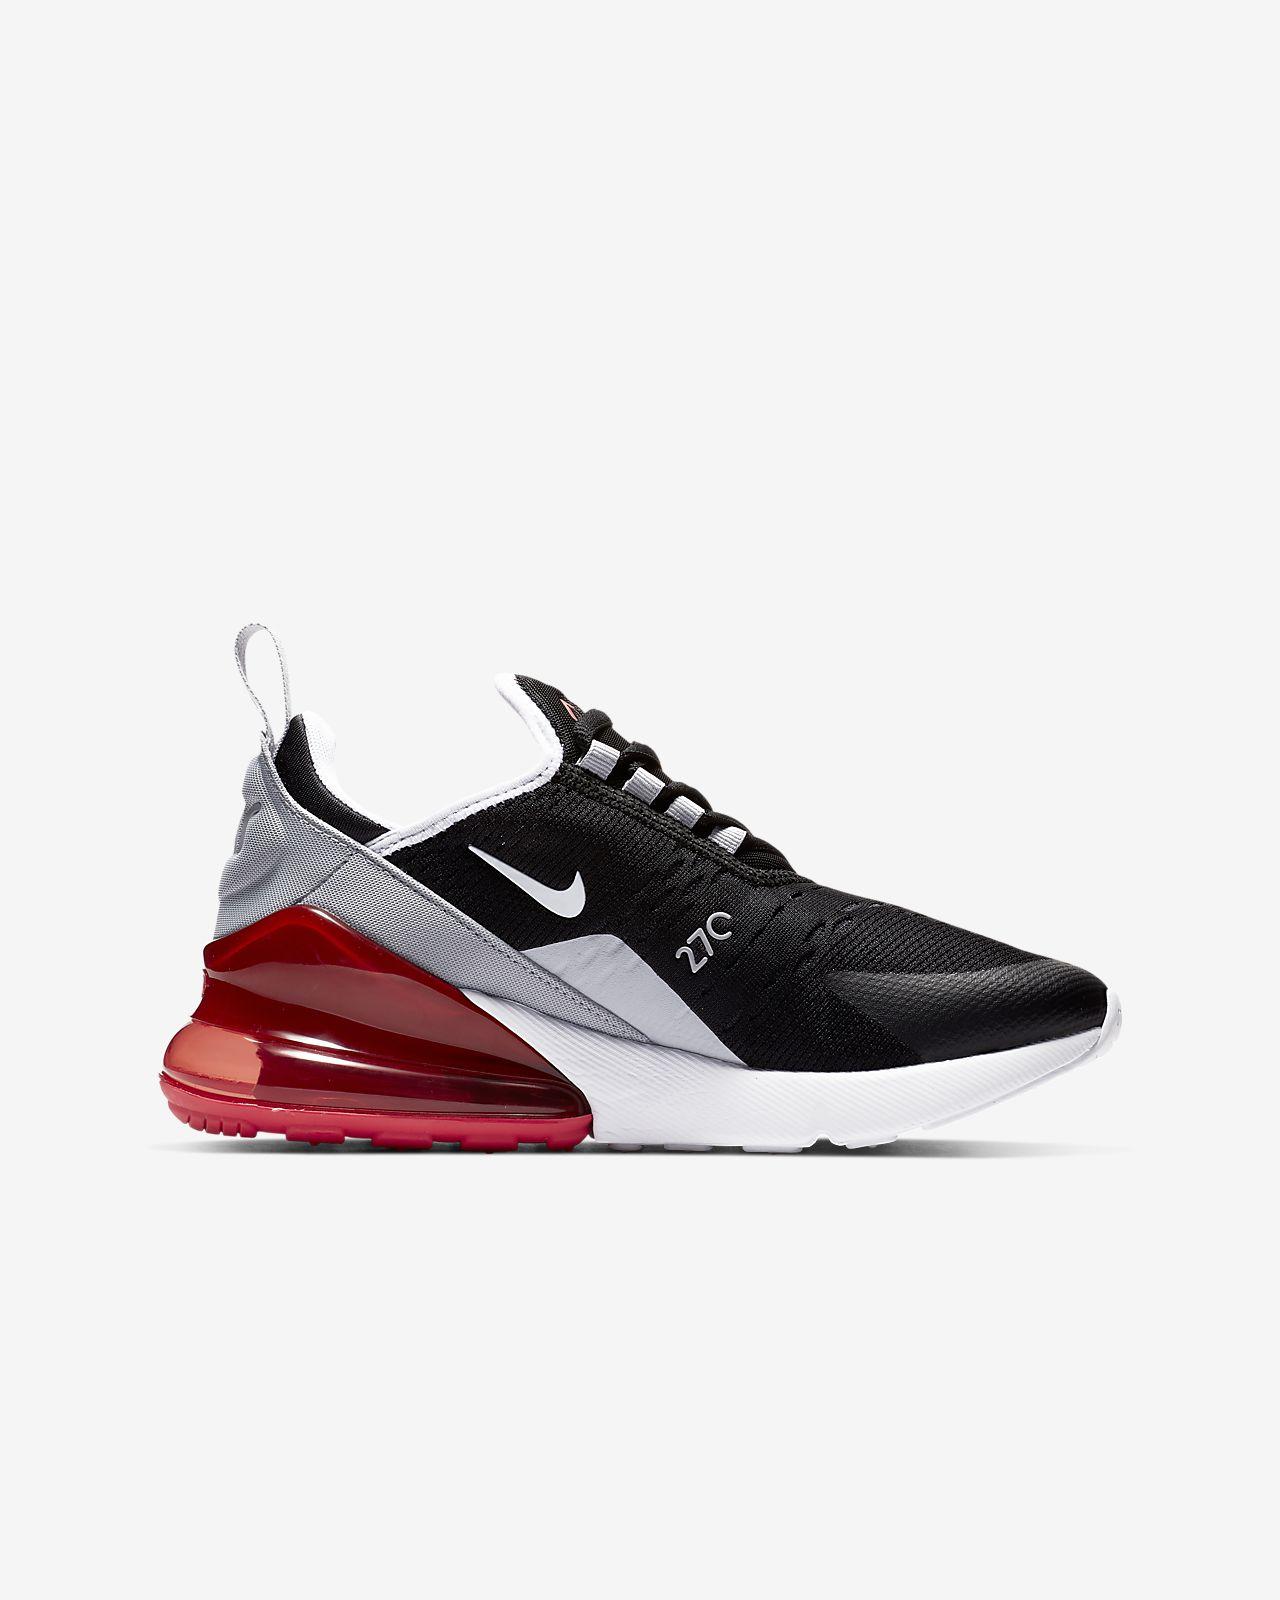 cheaper 61361 4ef1b Nike Air Max 270